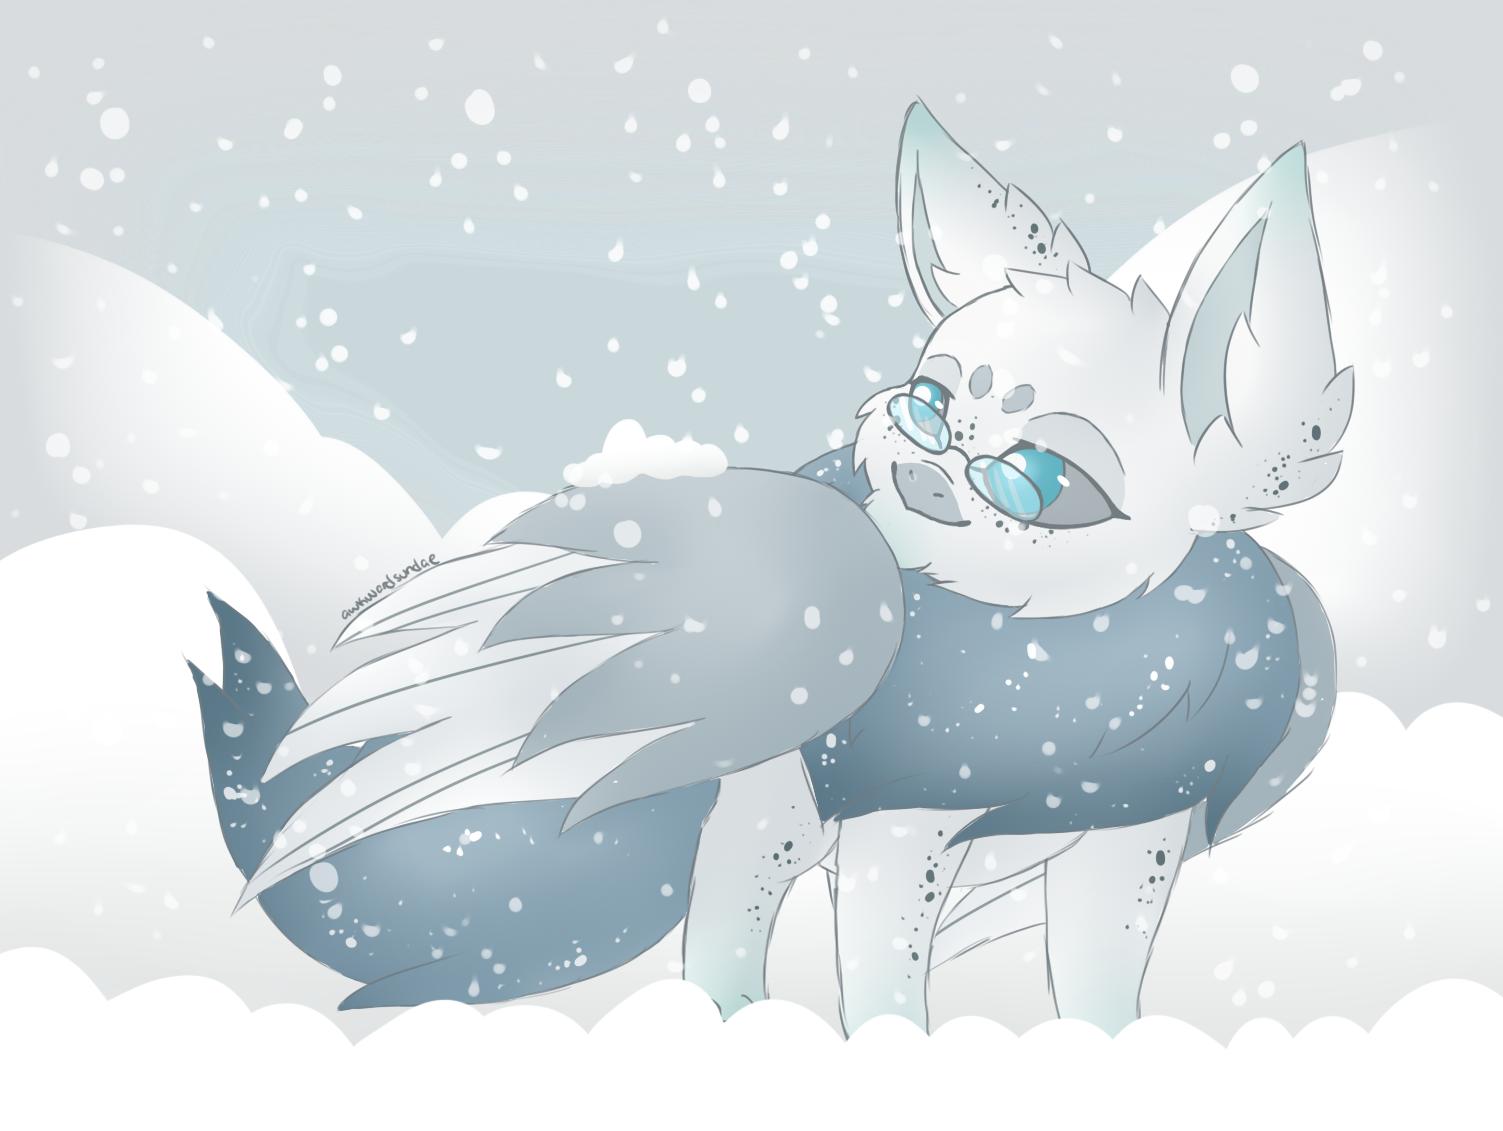 fw_snow_by_li_fae-datzwm2.png